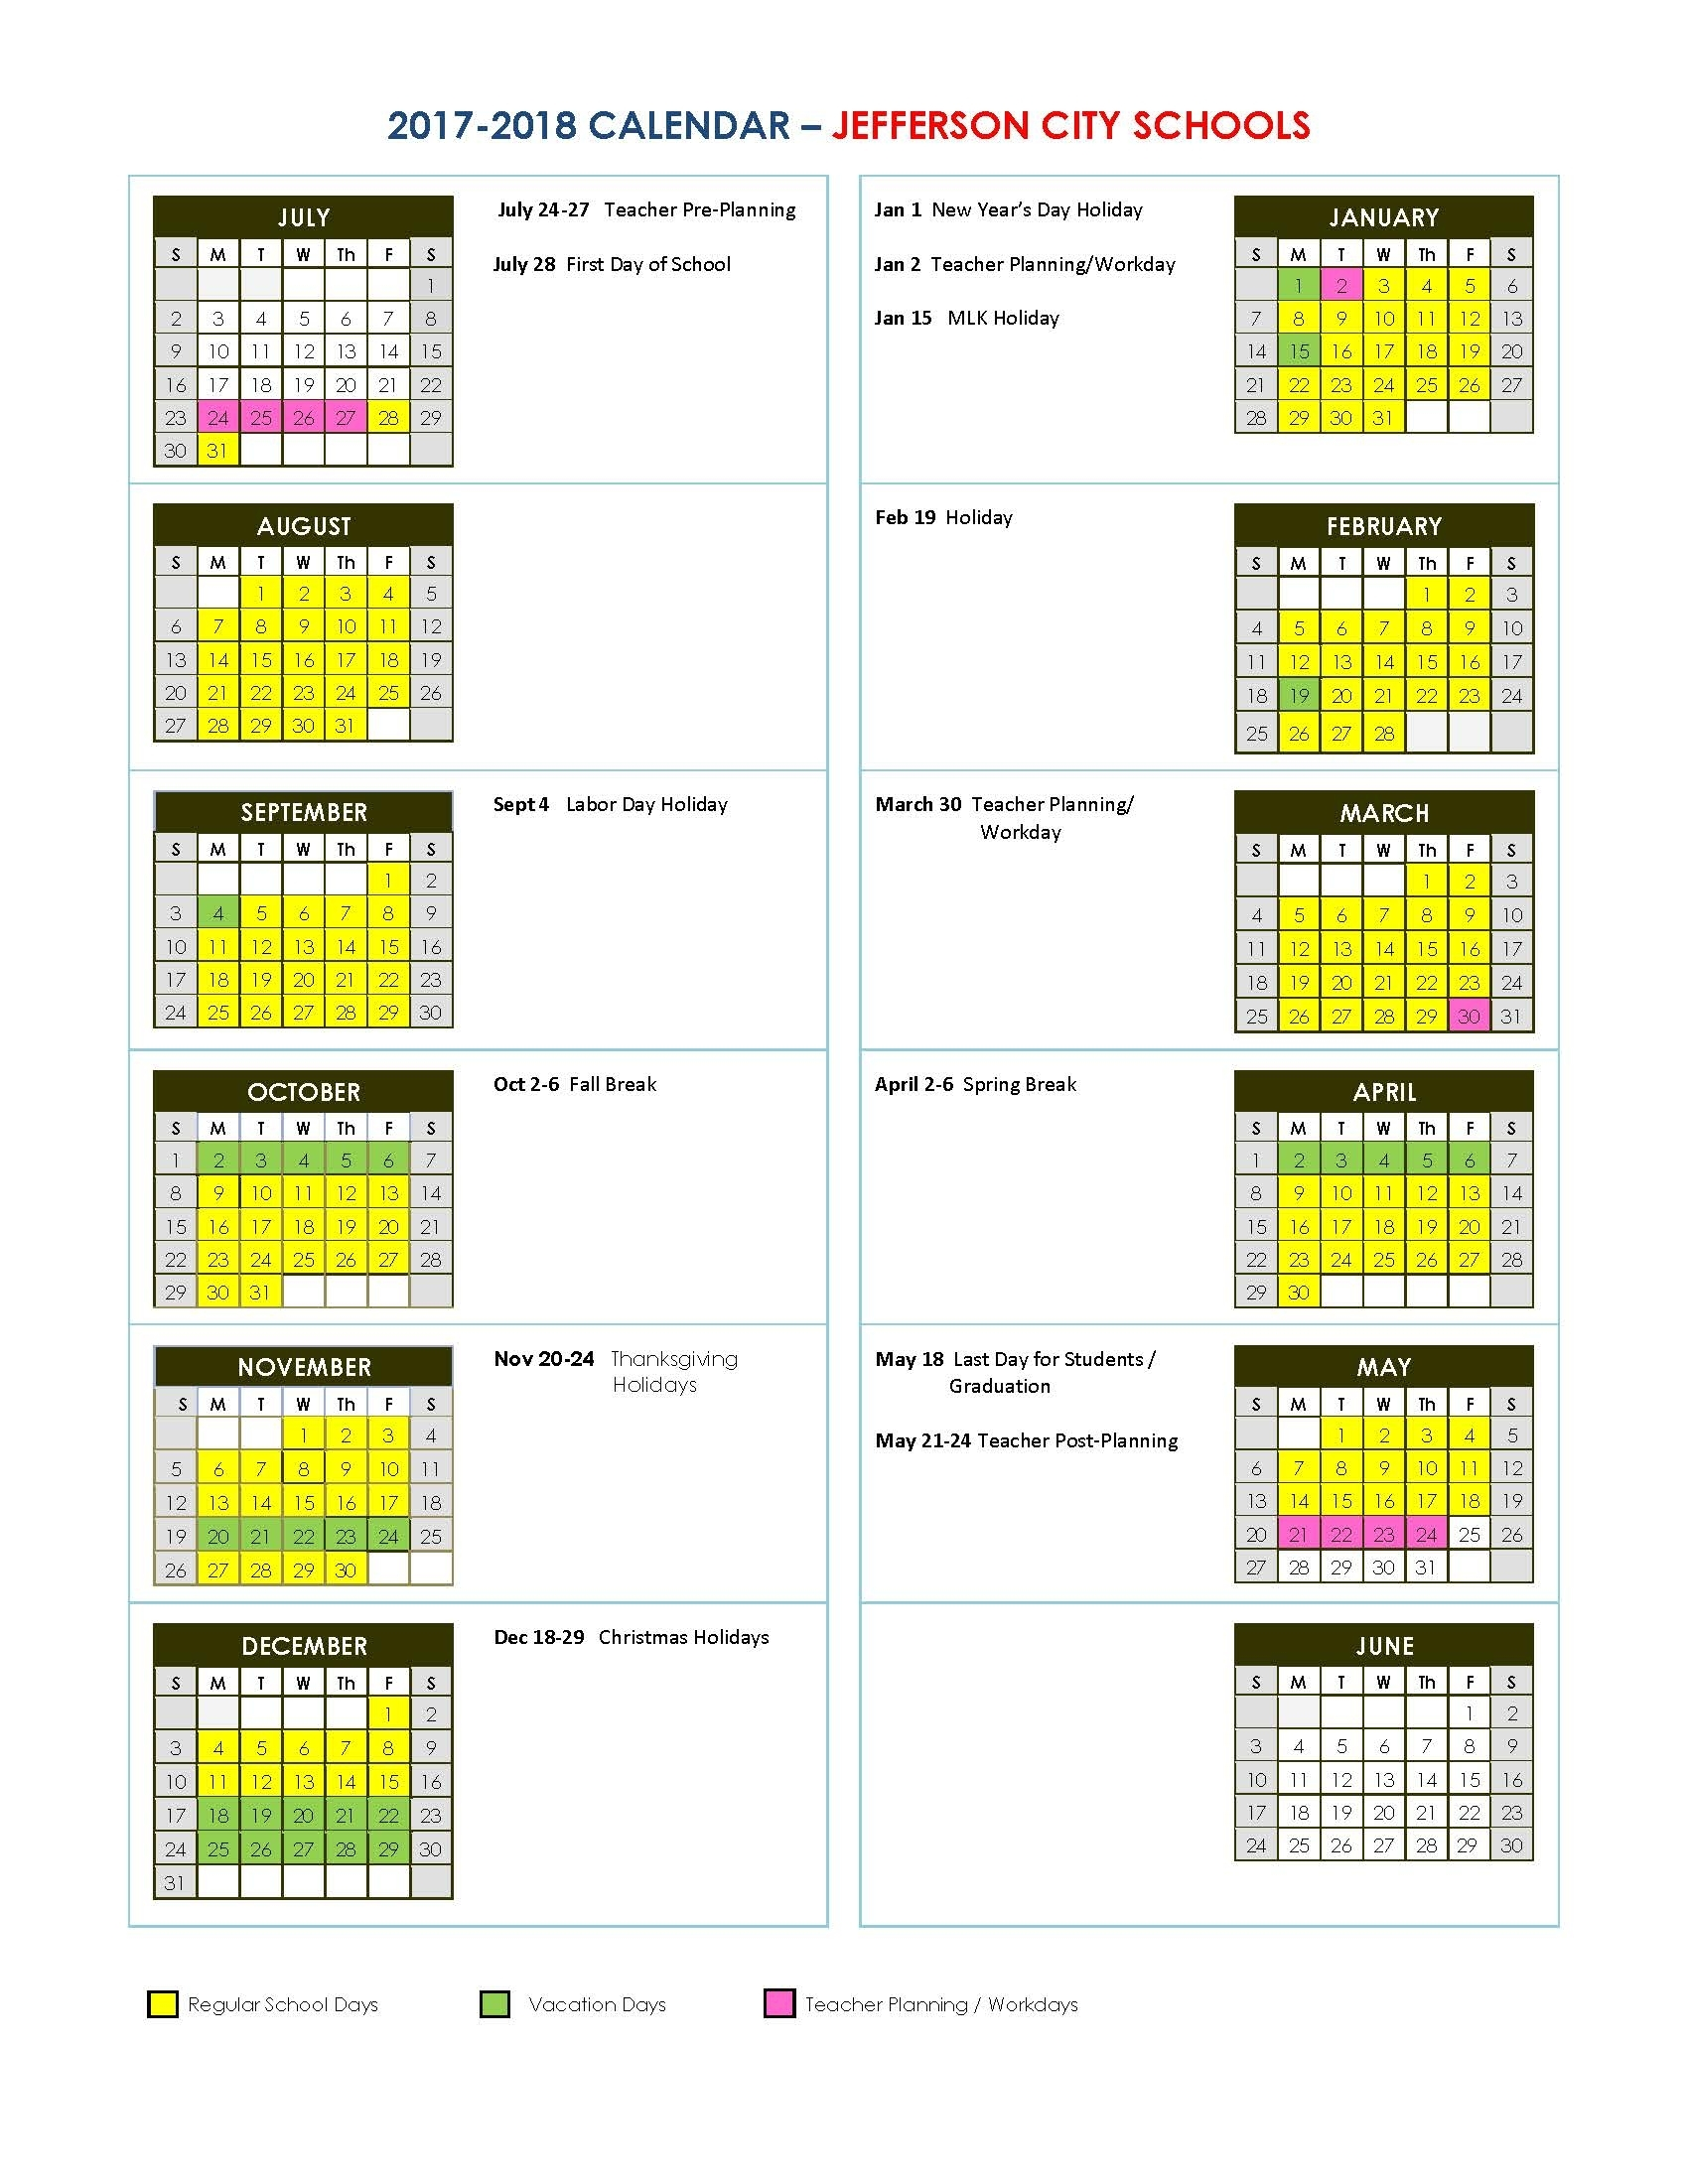 Jefferson City Schools pertaining to Uga Calendar 2019-2020